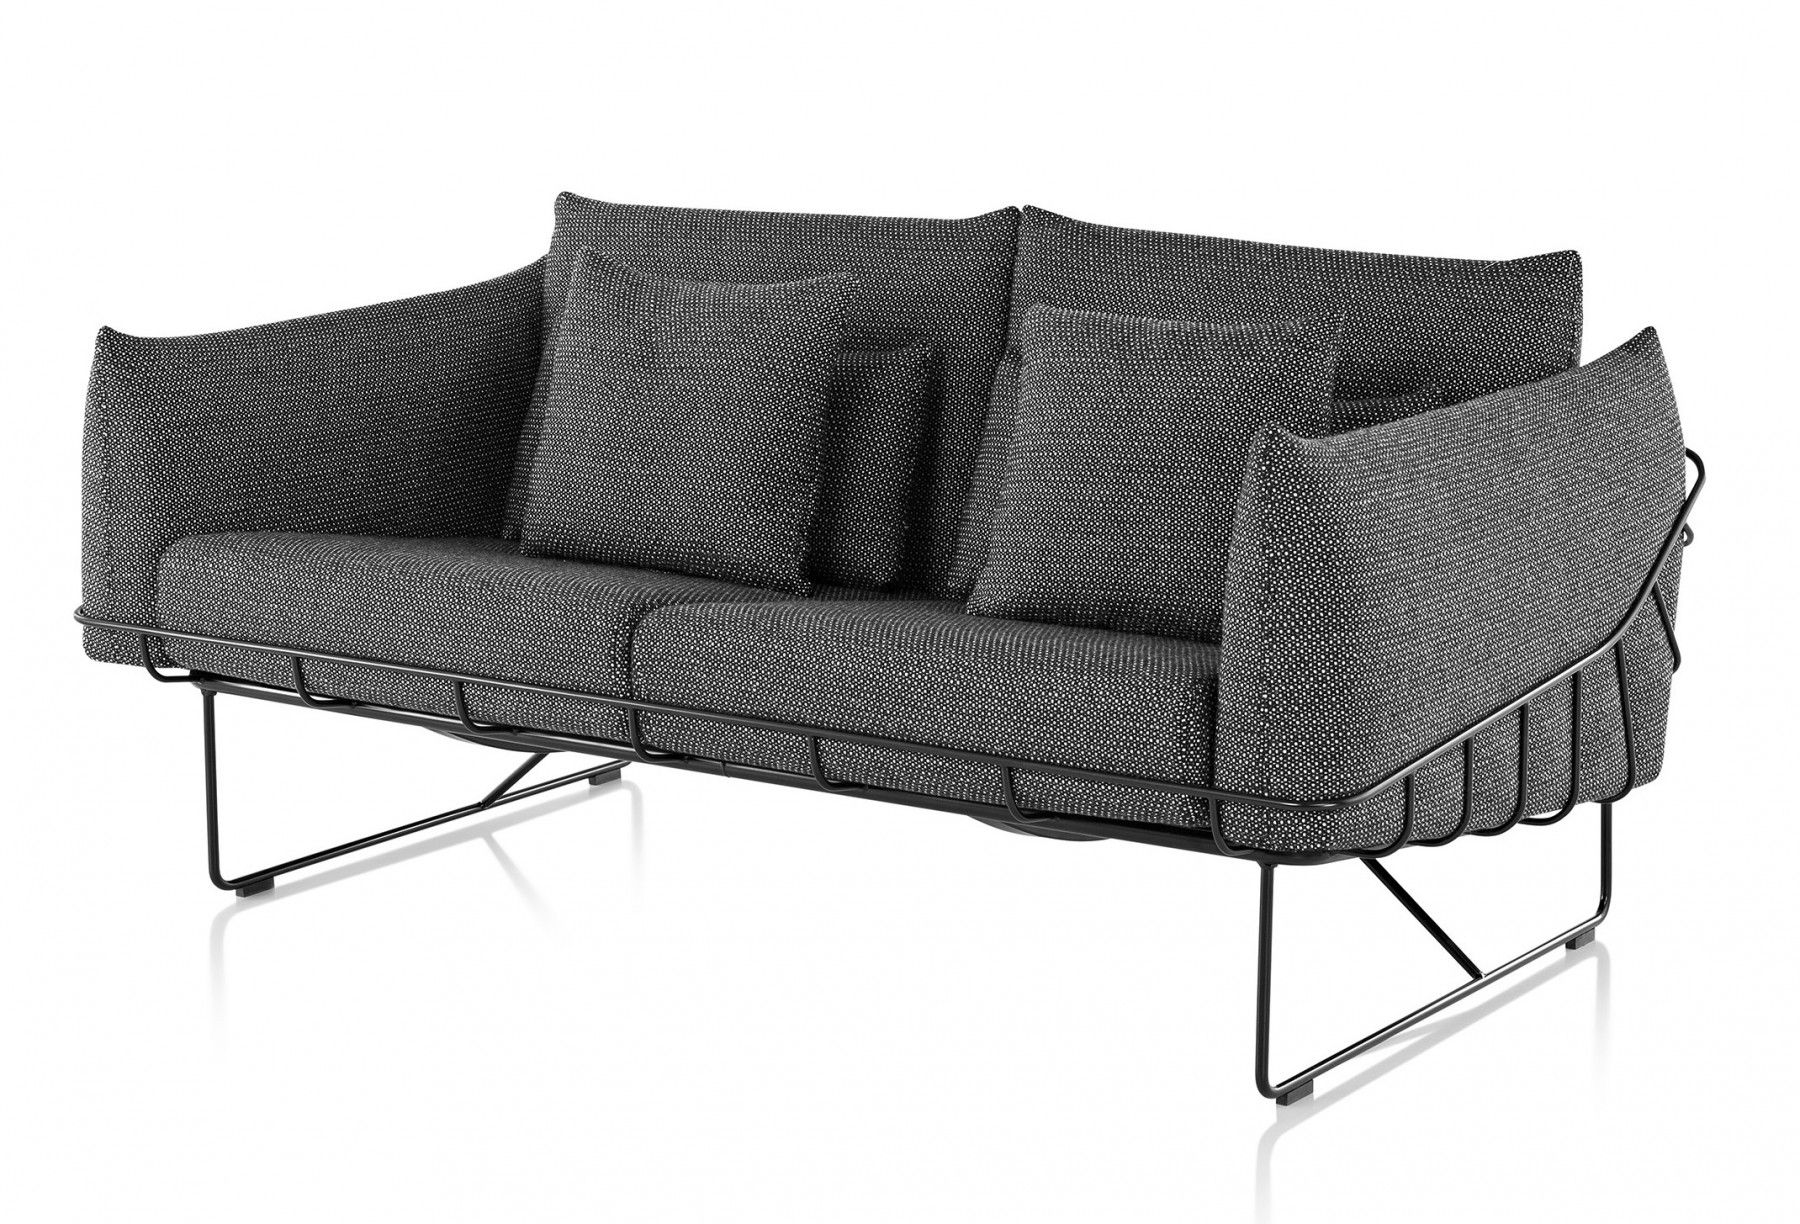 Herman Miller Tuxedo Sofa Tray Uk Dimensions Taraba Home Review